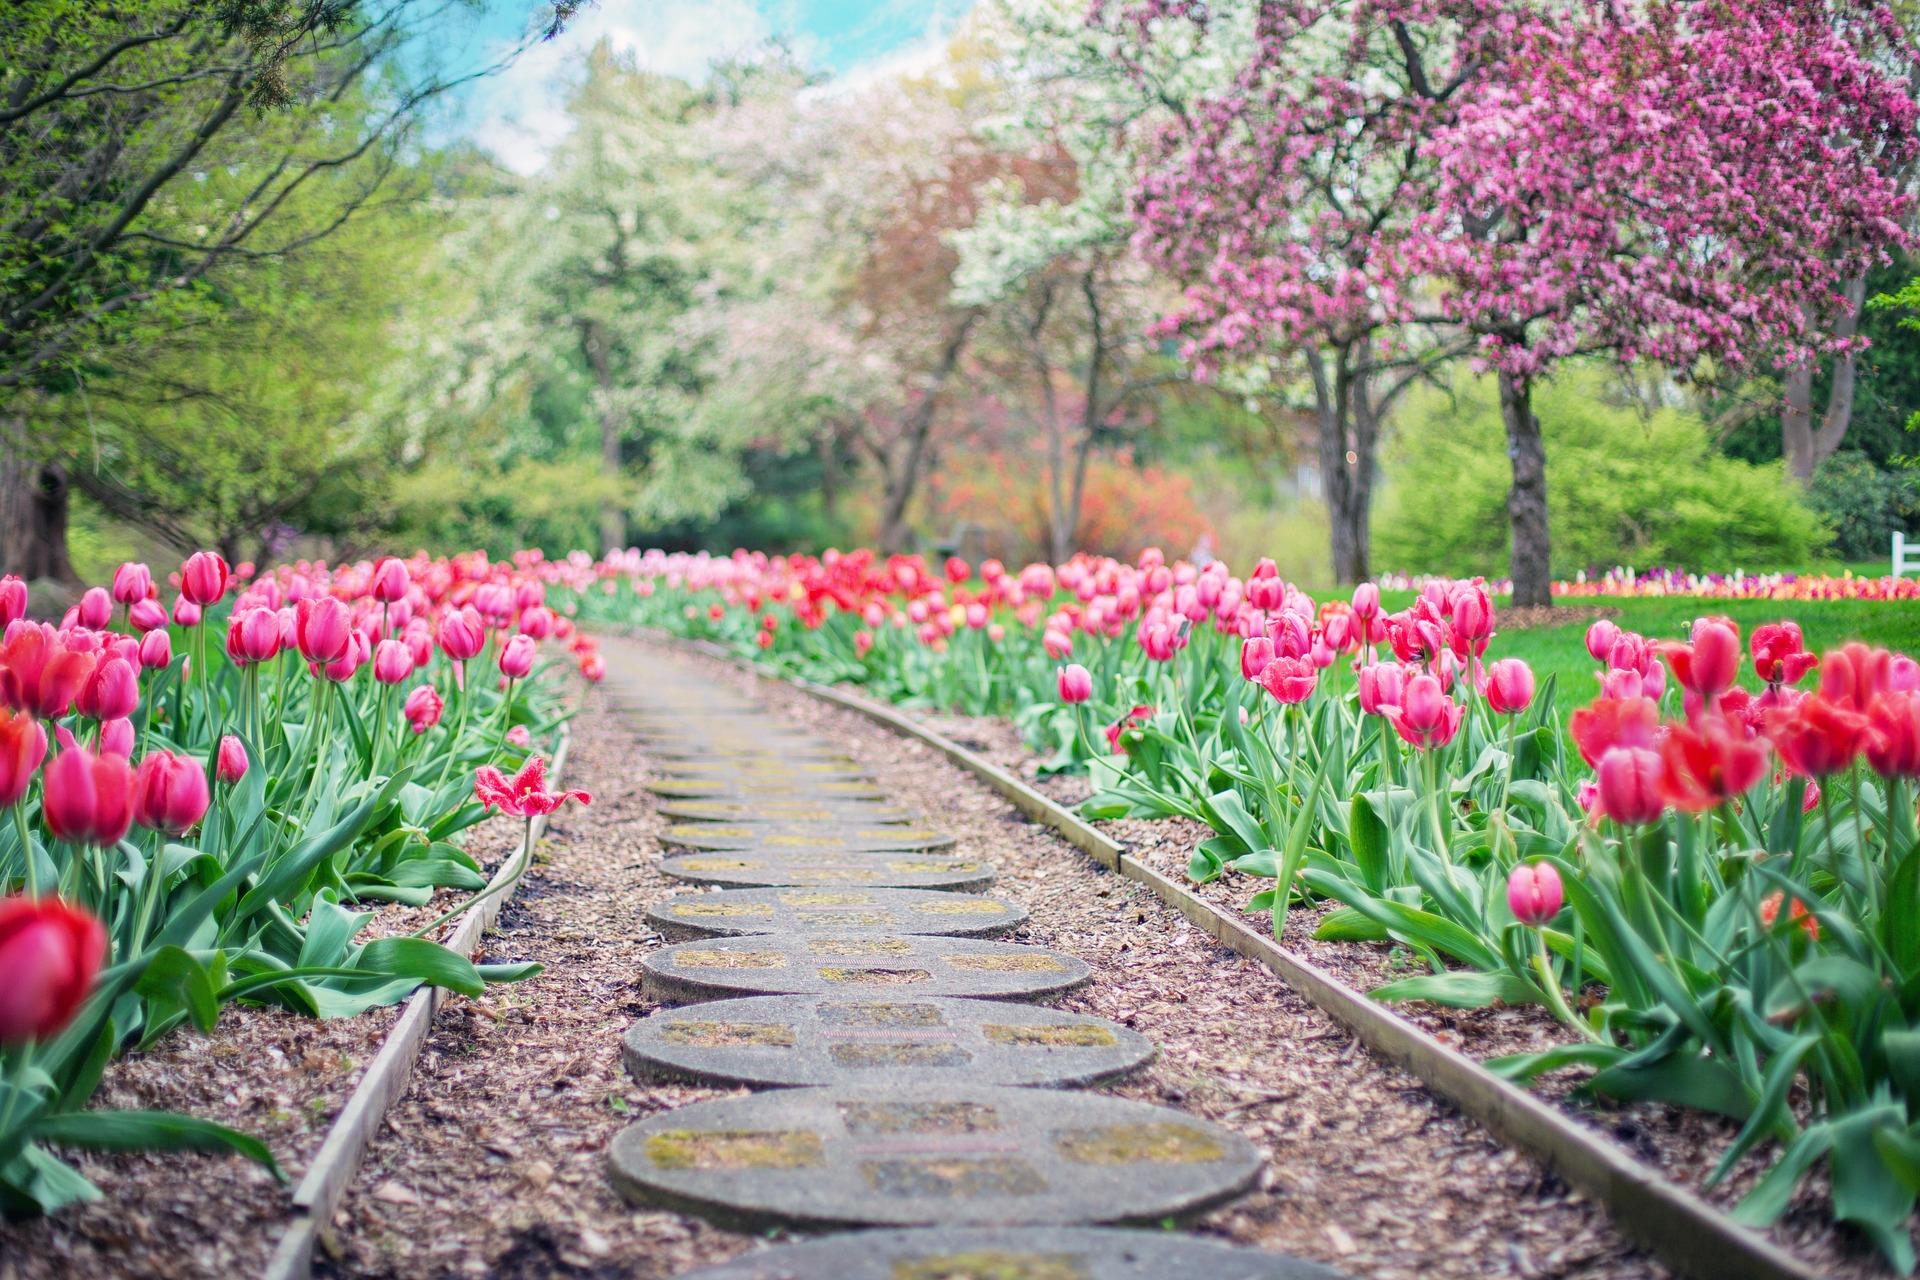 garden with a path